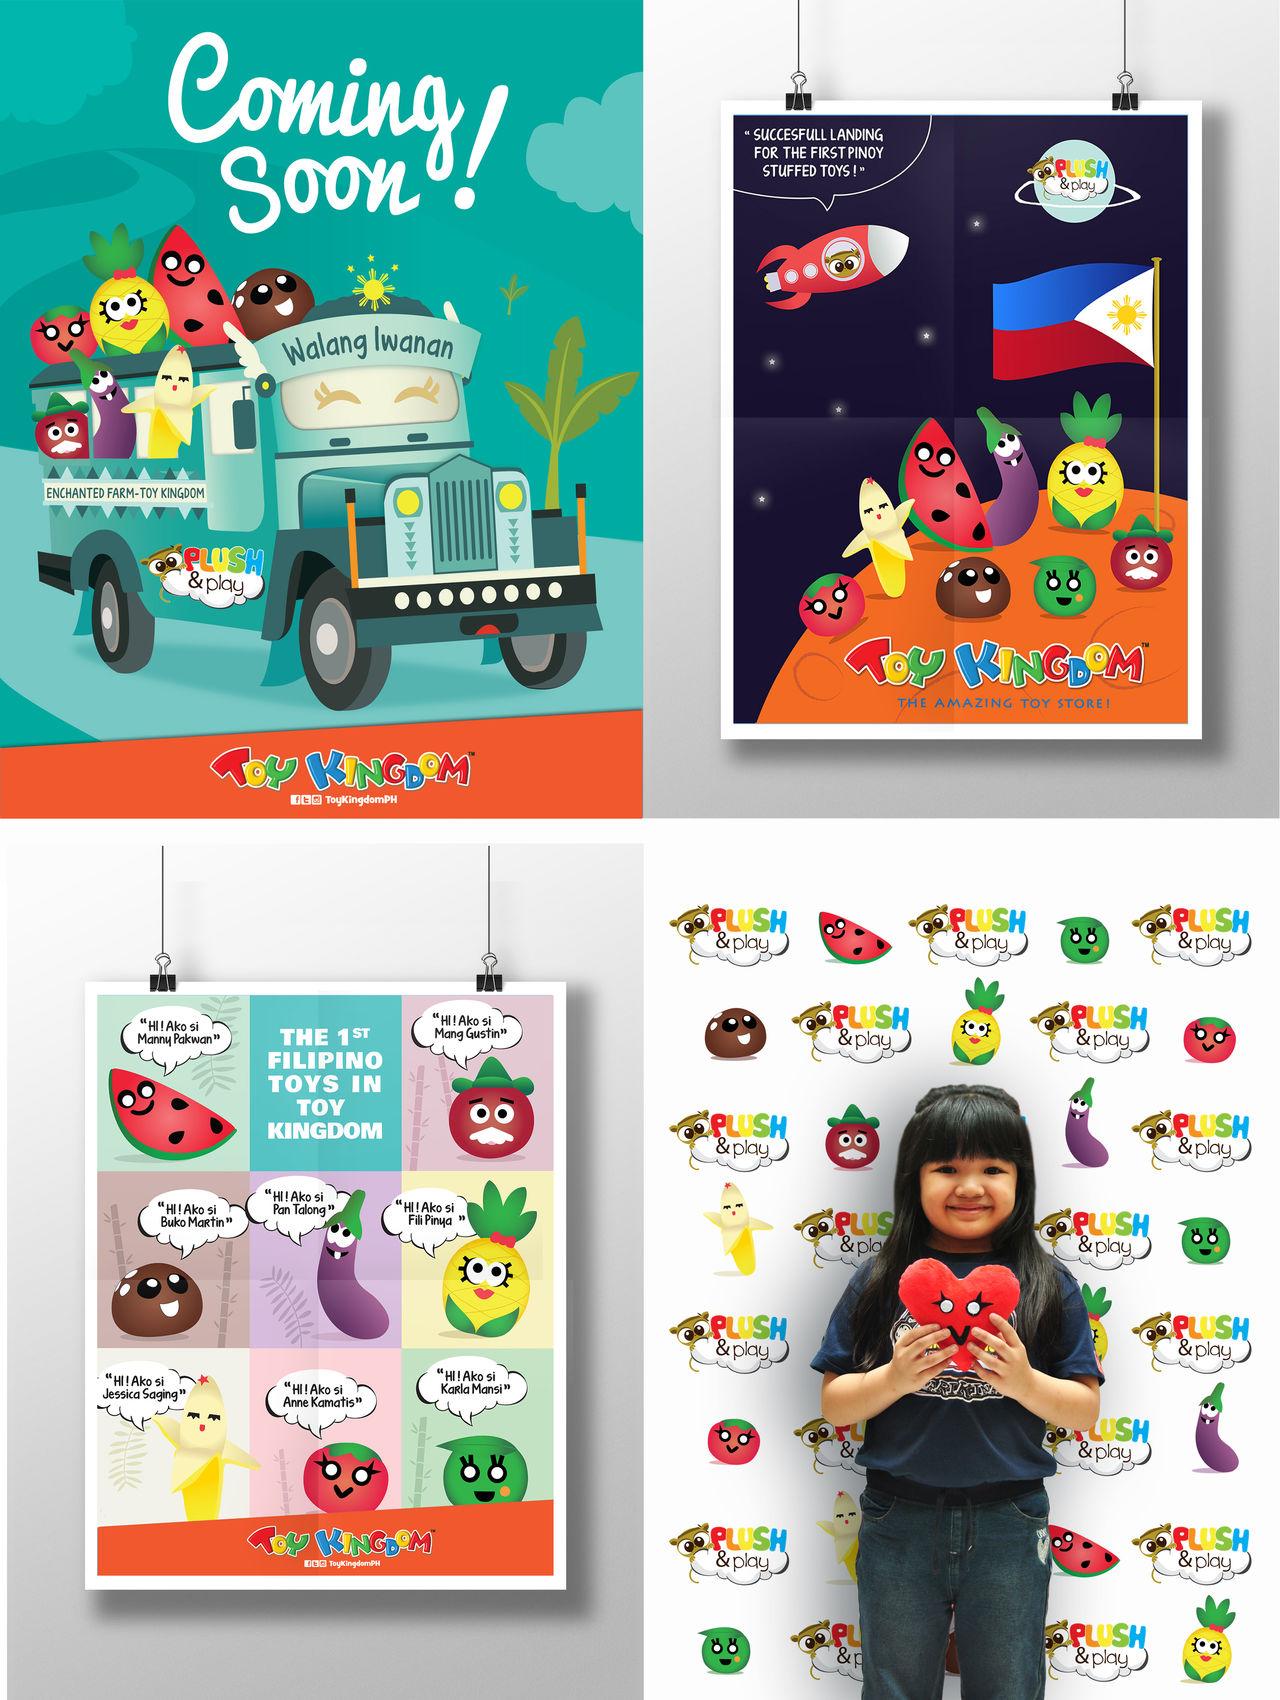 Plush & Play Poster